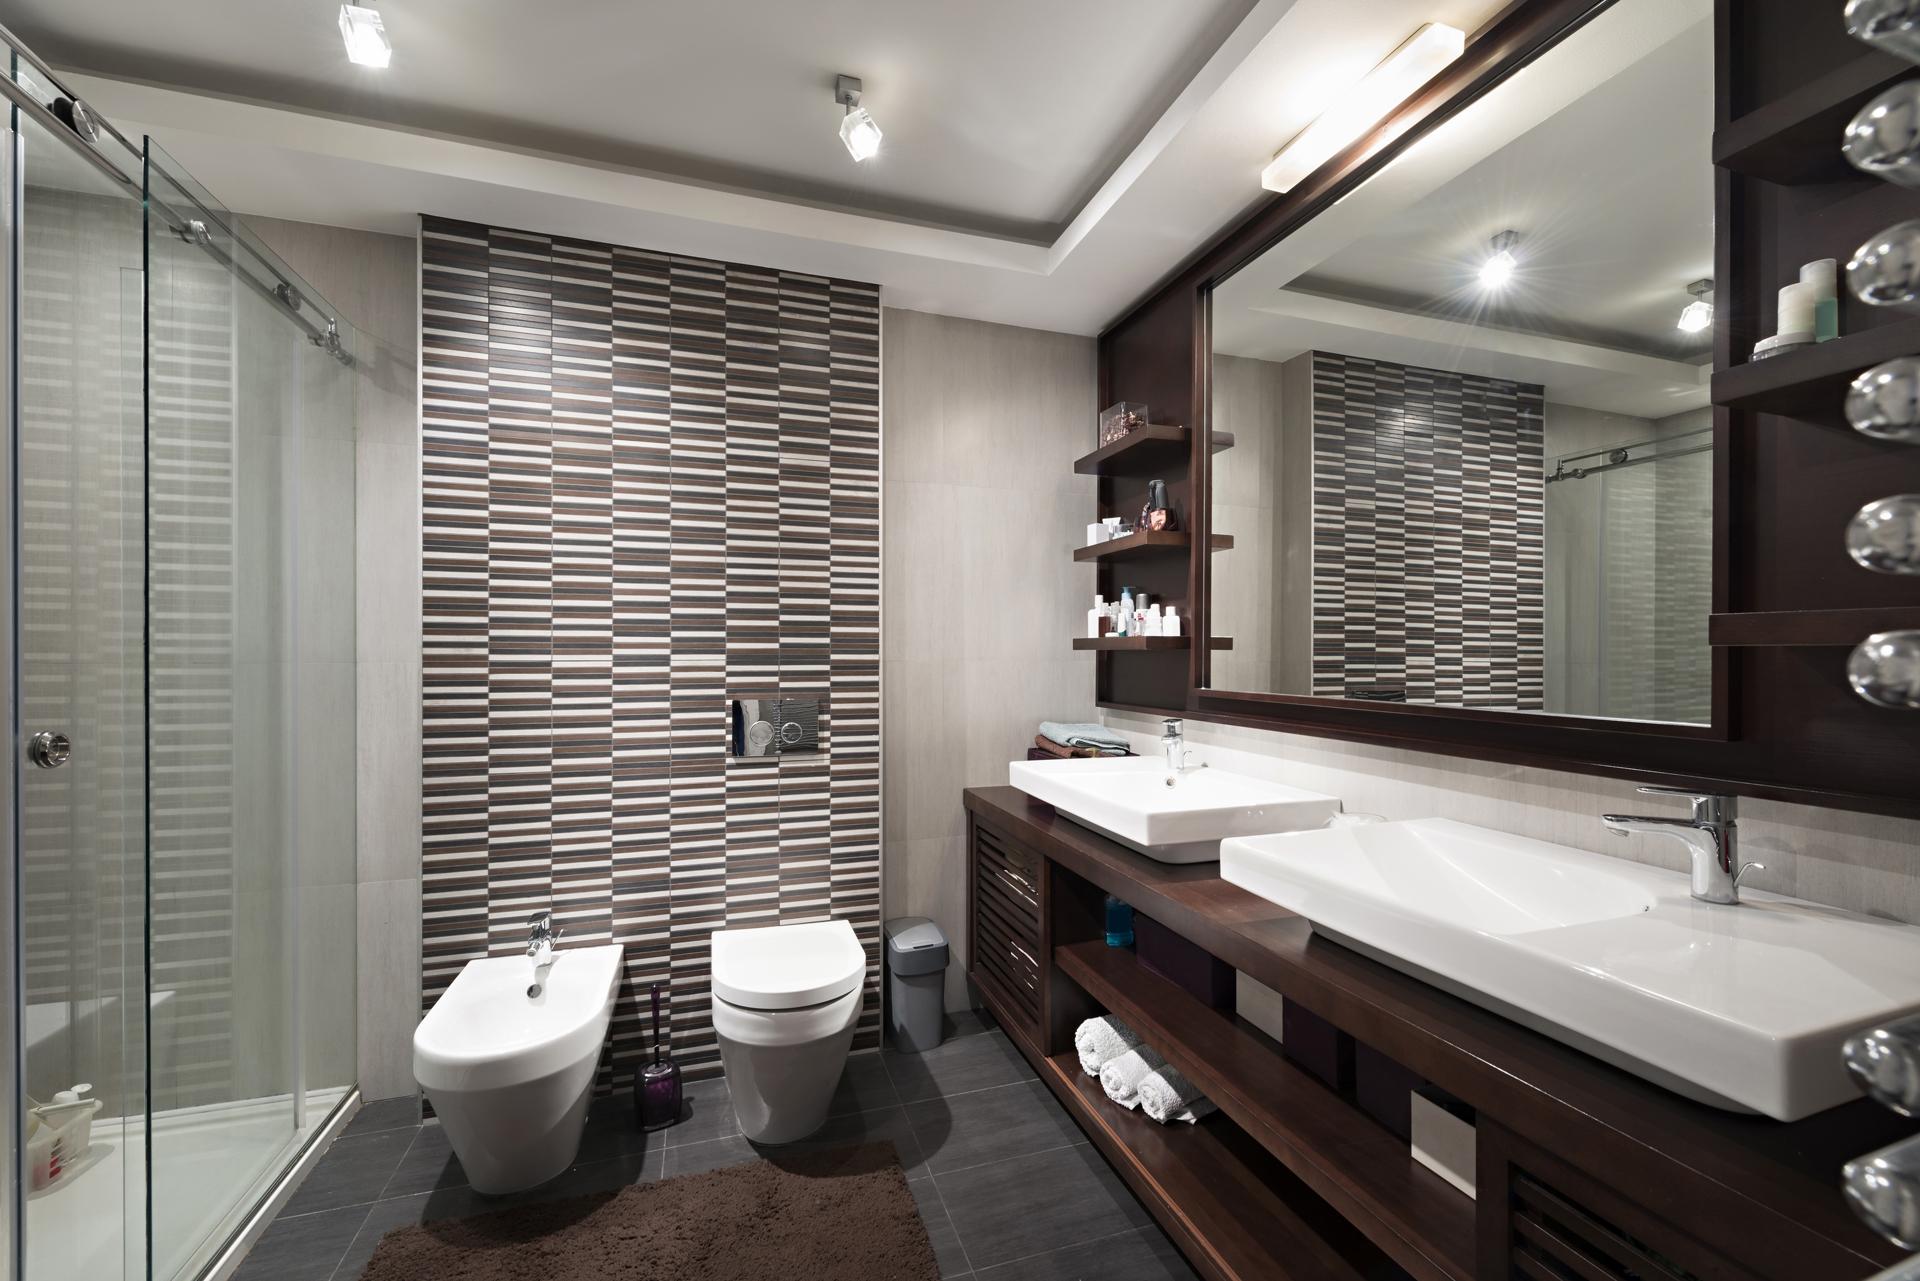 cosi sanitair specialist in badkamers en sanitair in katwijk aan zee